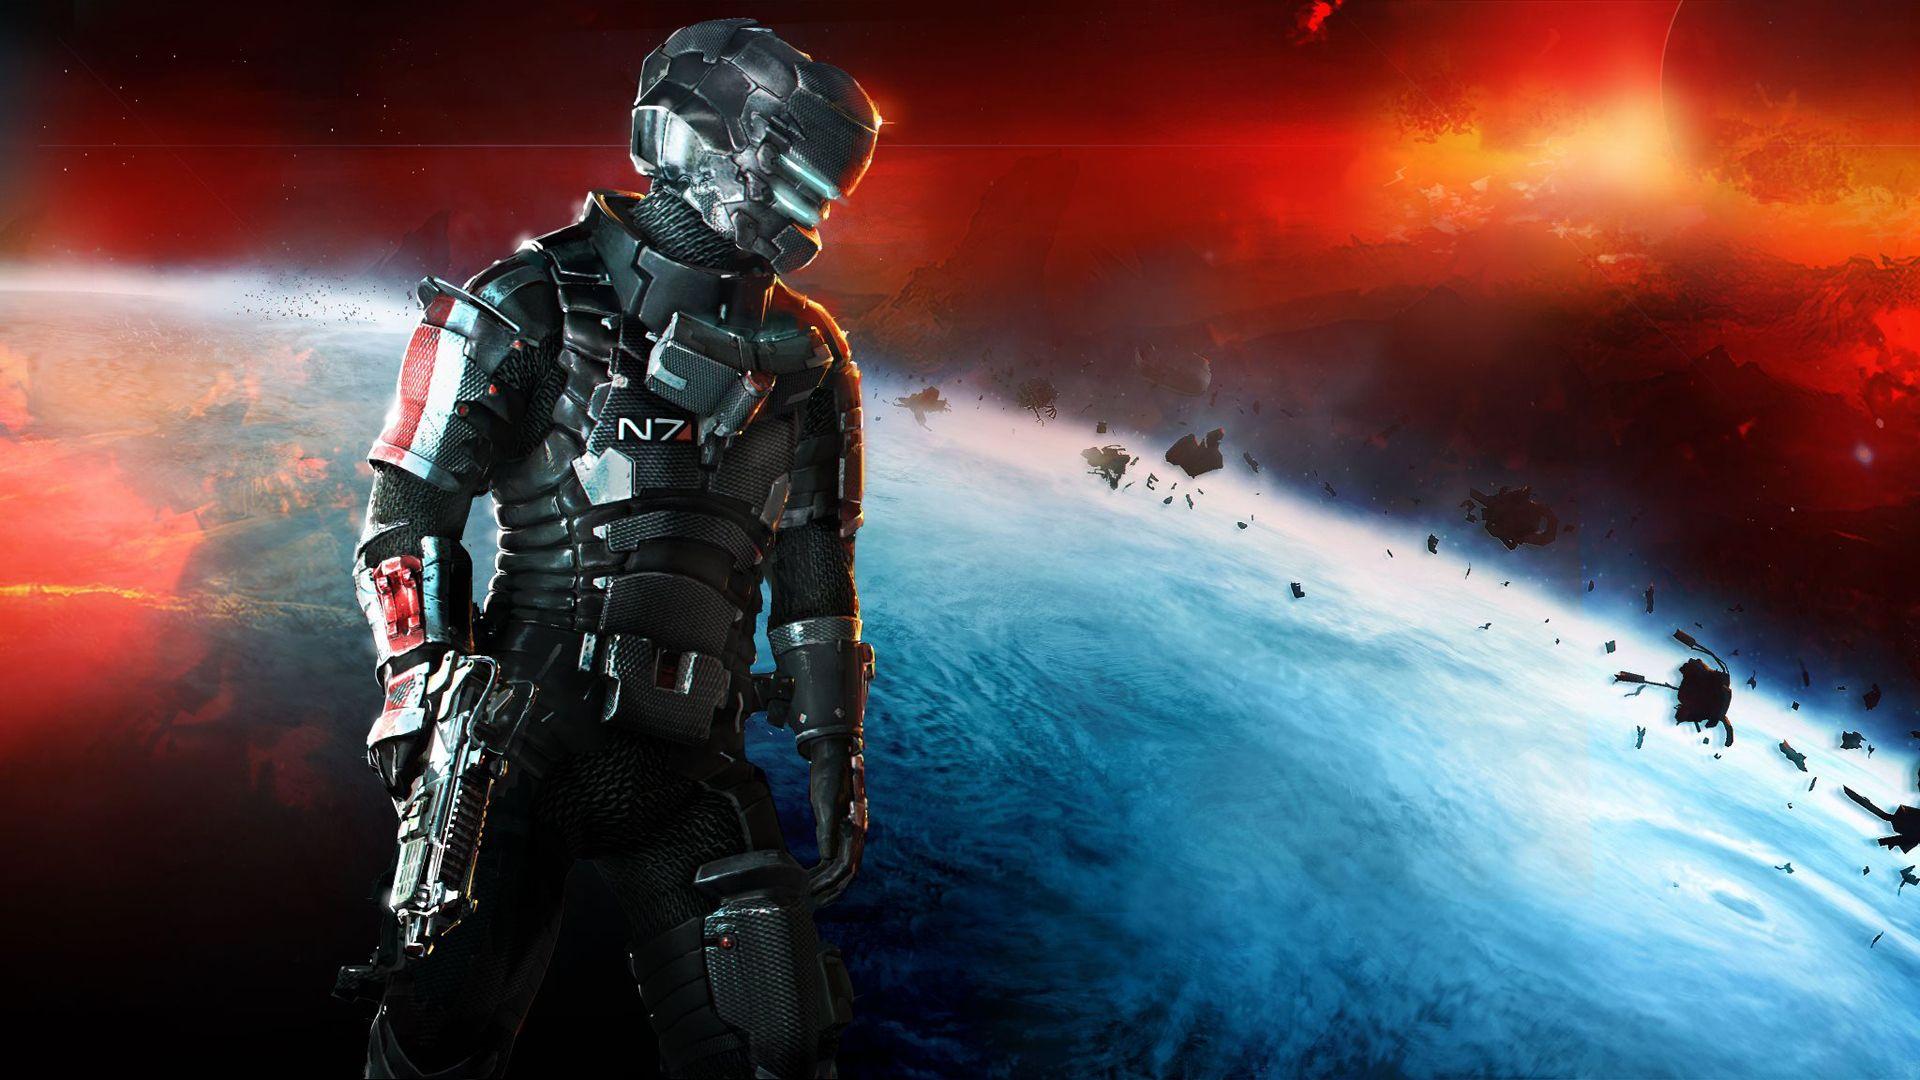 Dead Space 3 N7 2378480 Hd Wallpaper Backgrounds Download